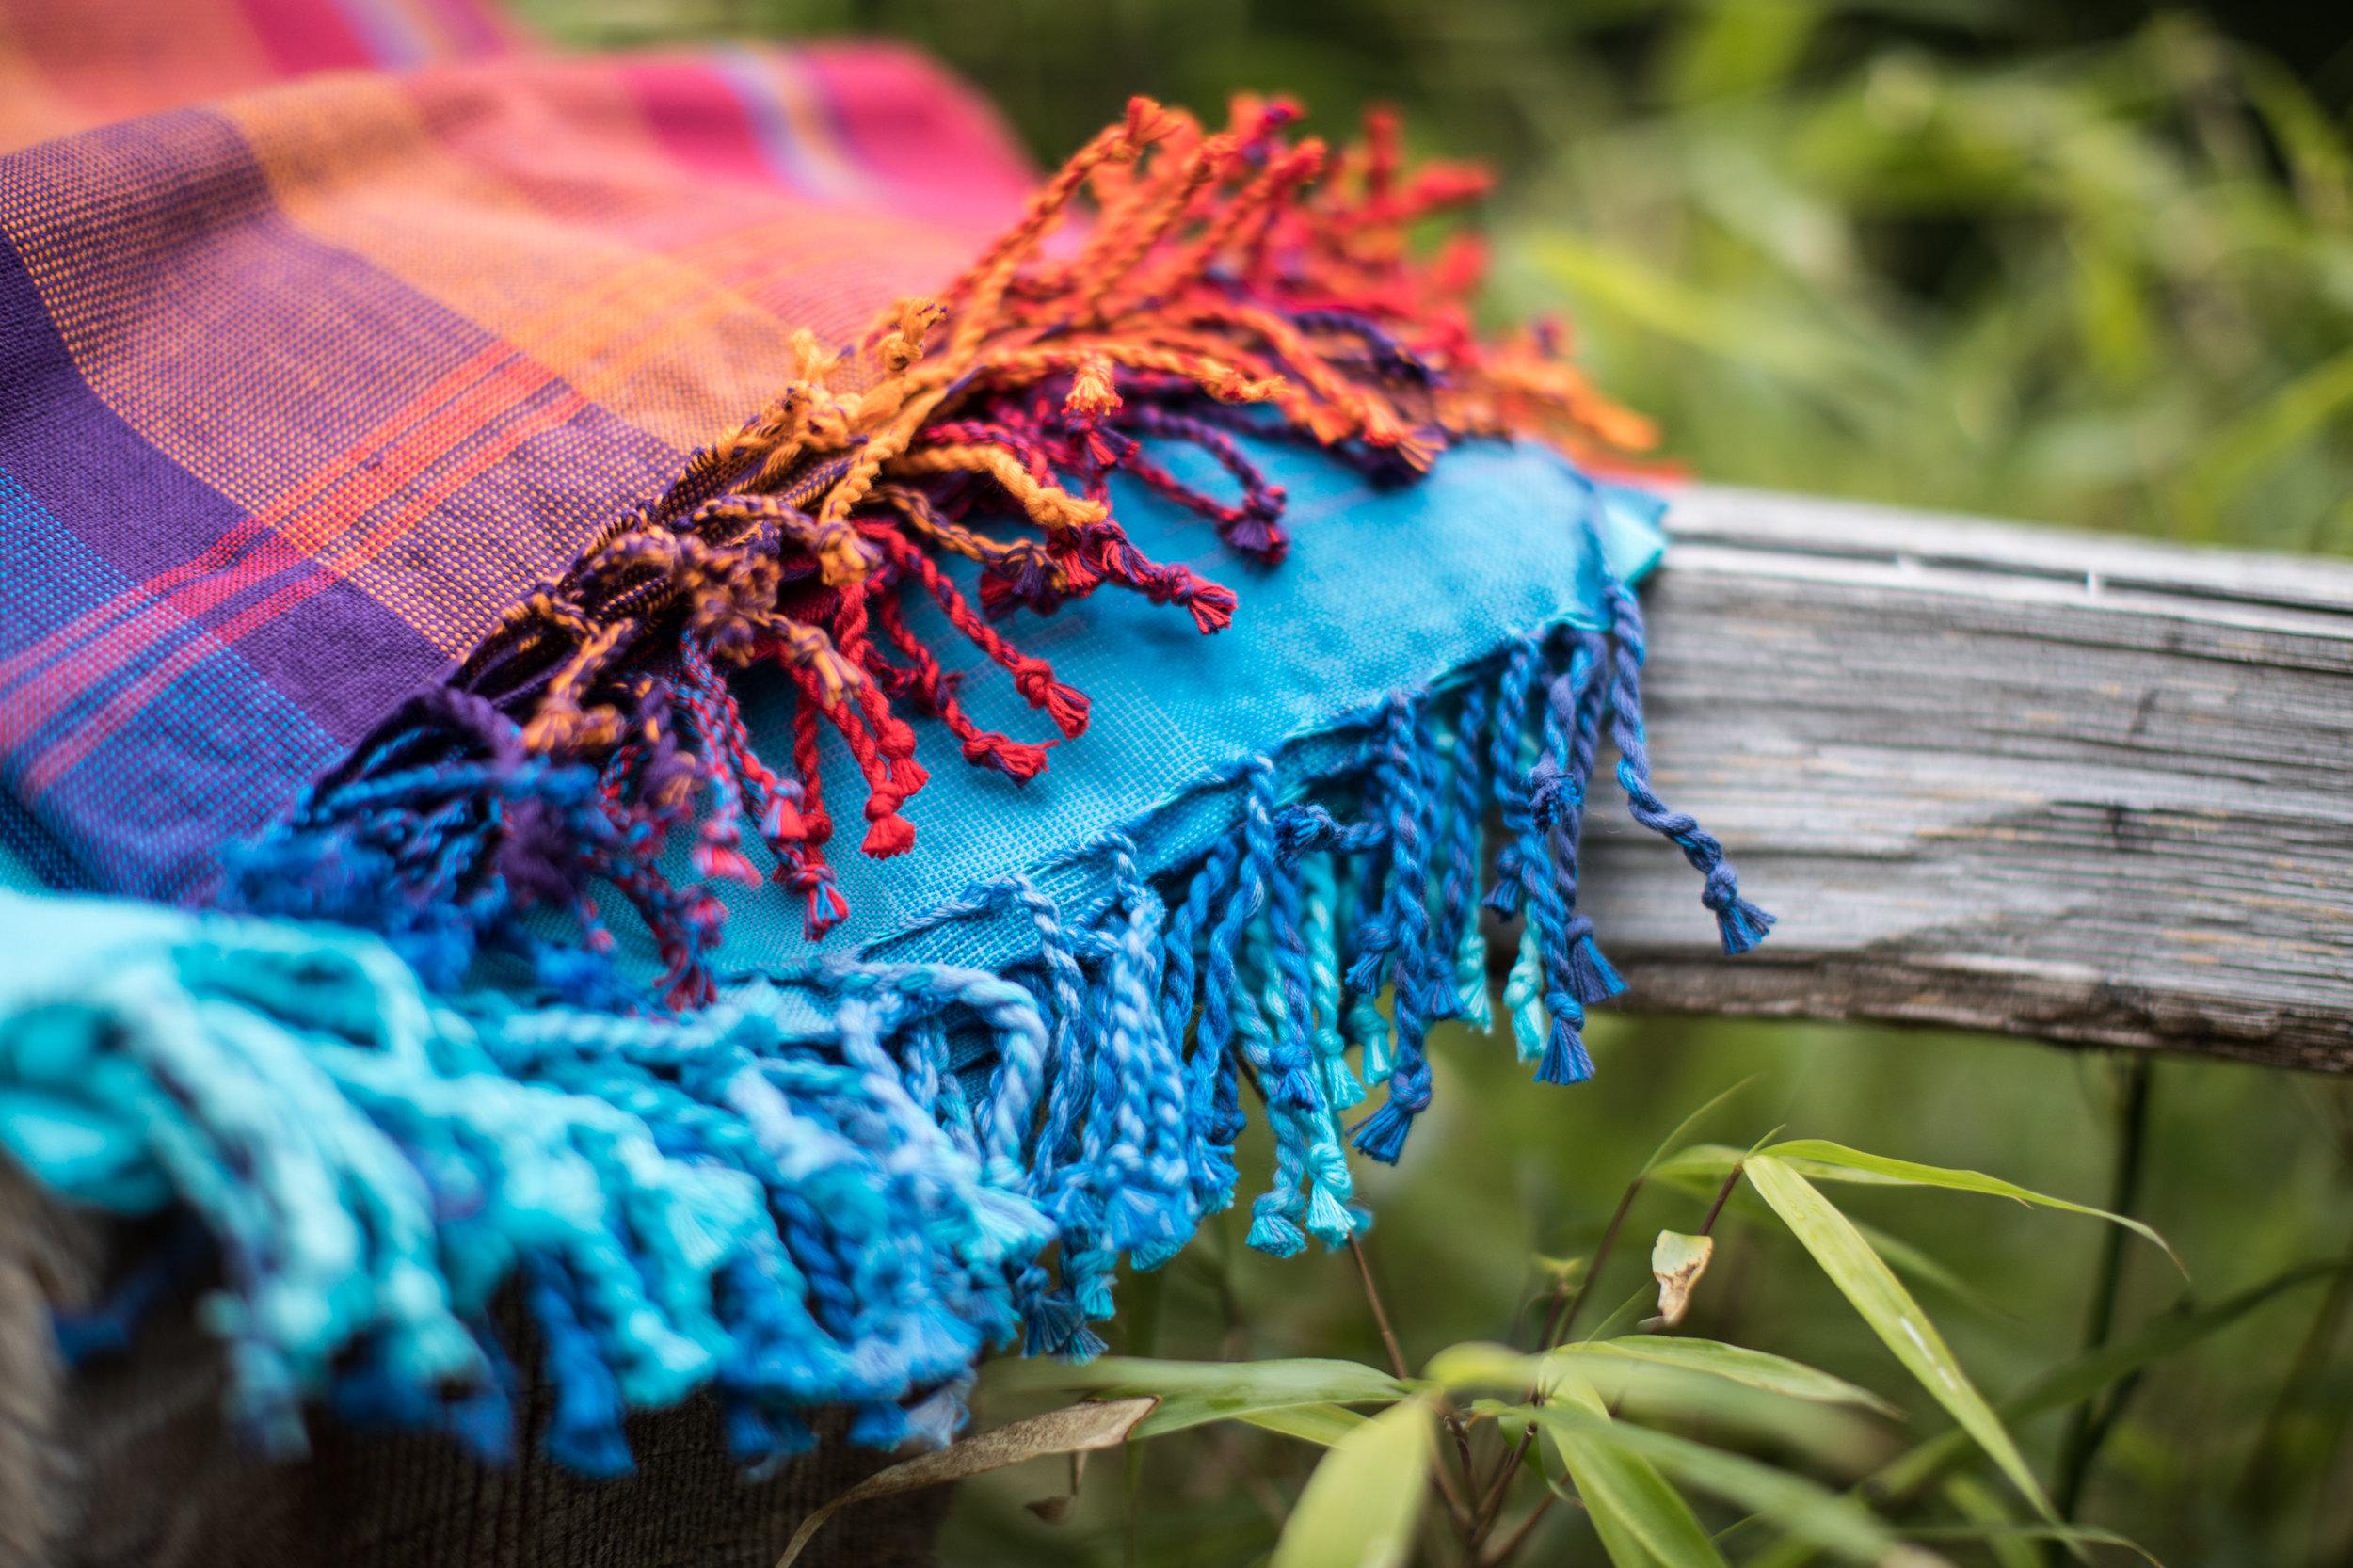 rudi-textiles-113-of-205.jpg